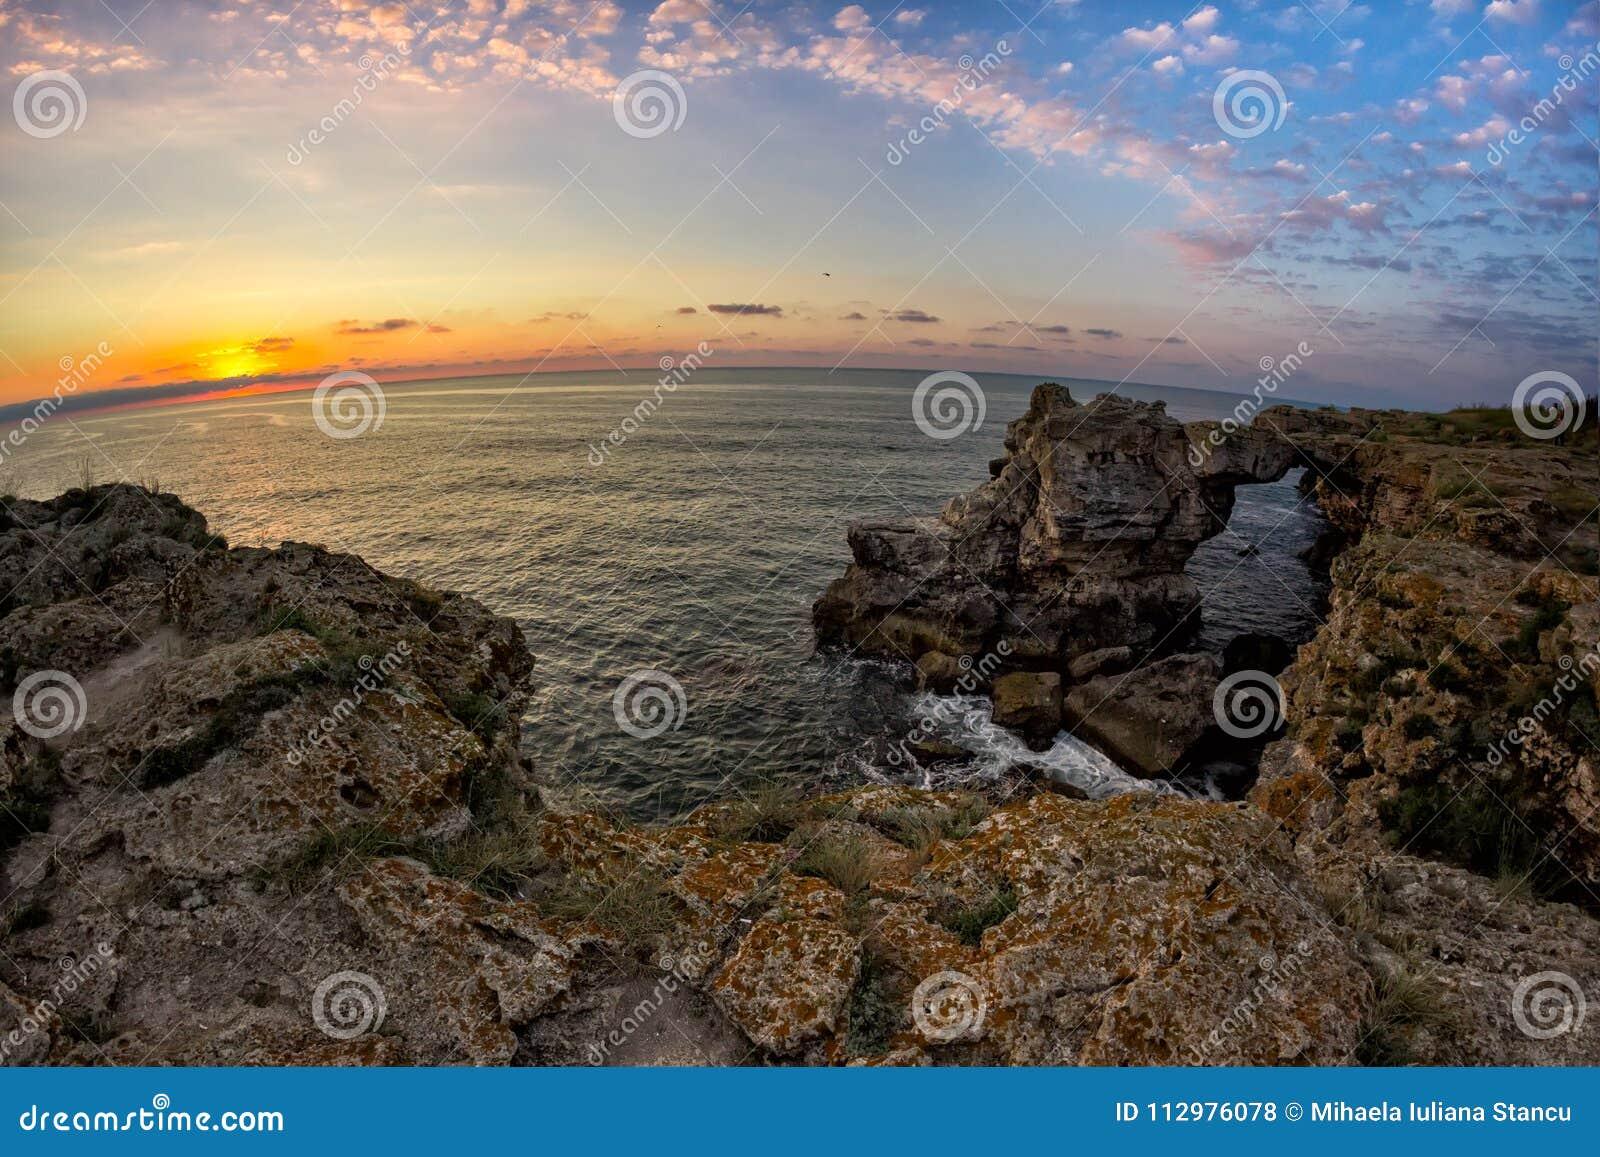 Beautiful sunrise over the Black Sea with rocks on the shore